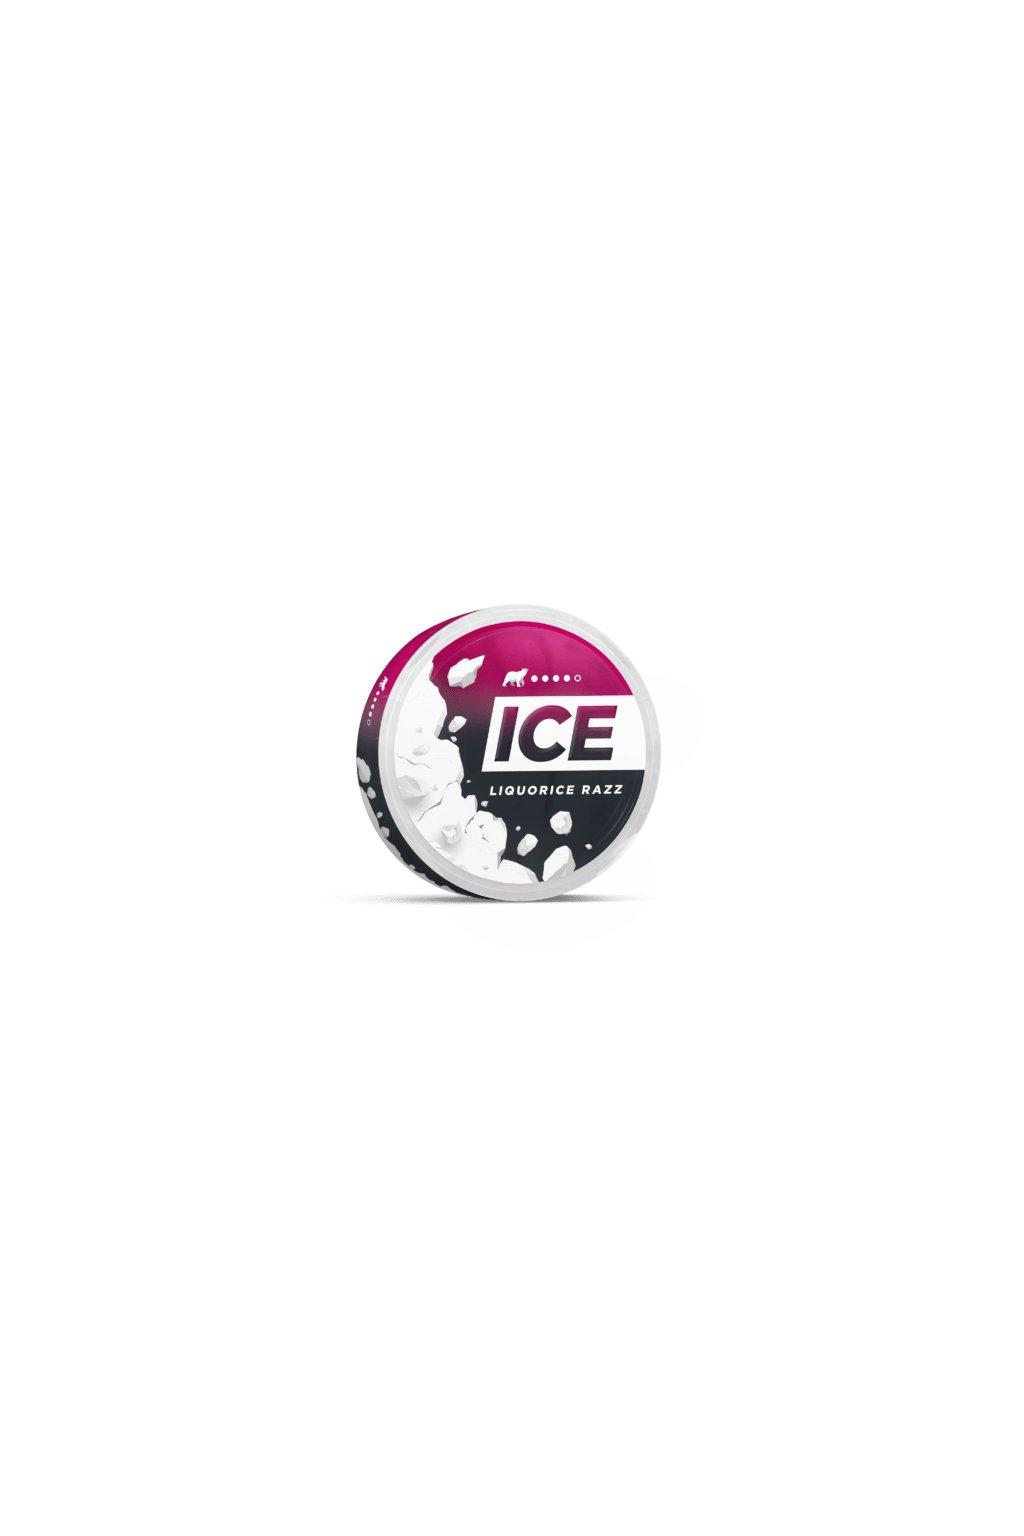 ICE liquorice ruzz nikotinove sacky